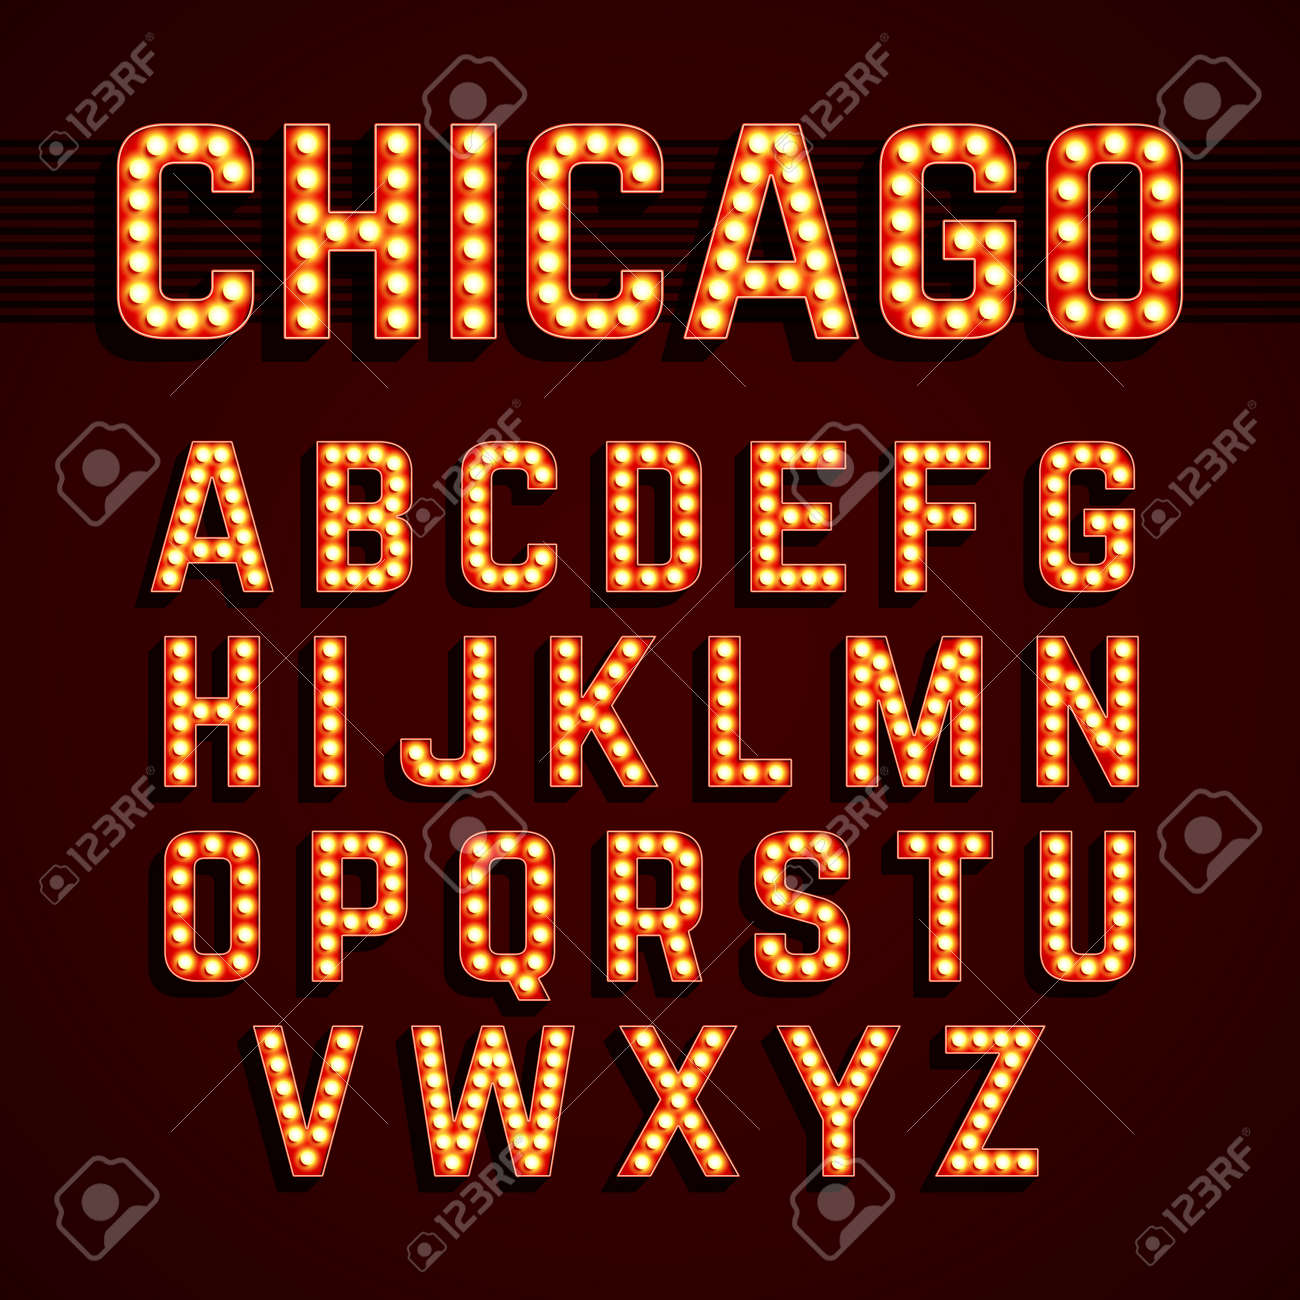 Broadway lights style light bulb alphabet - 40047591